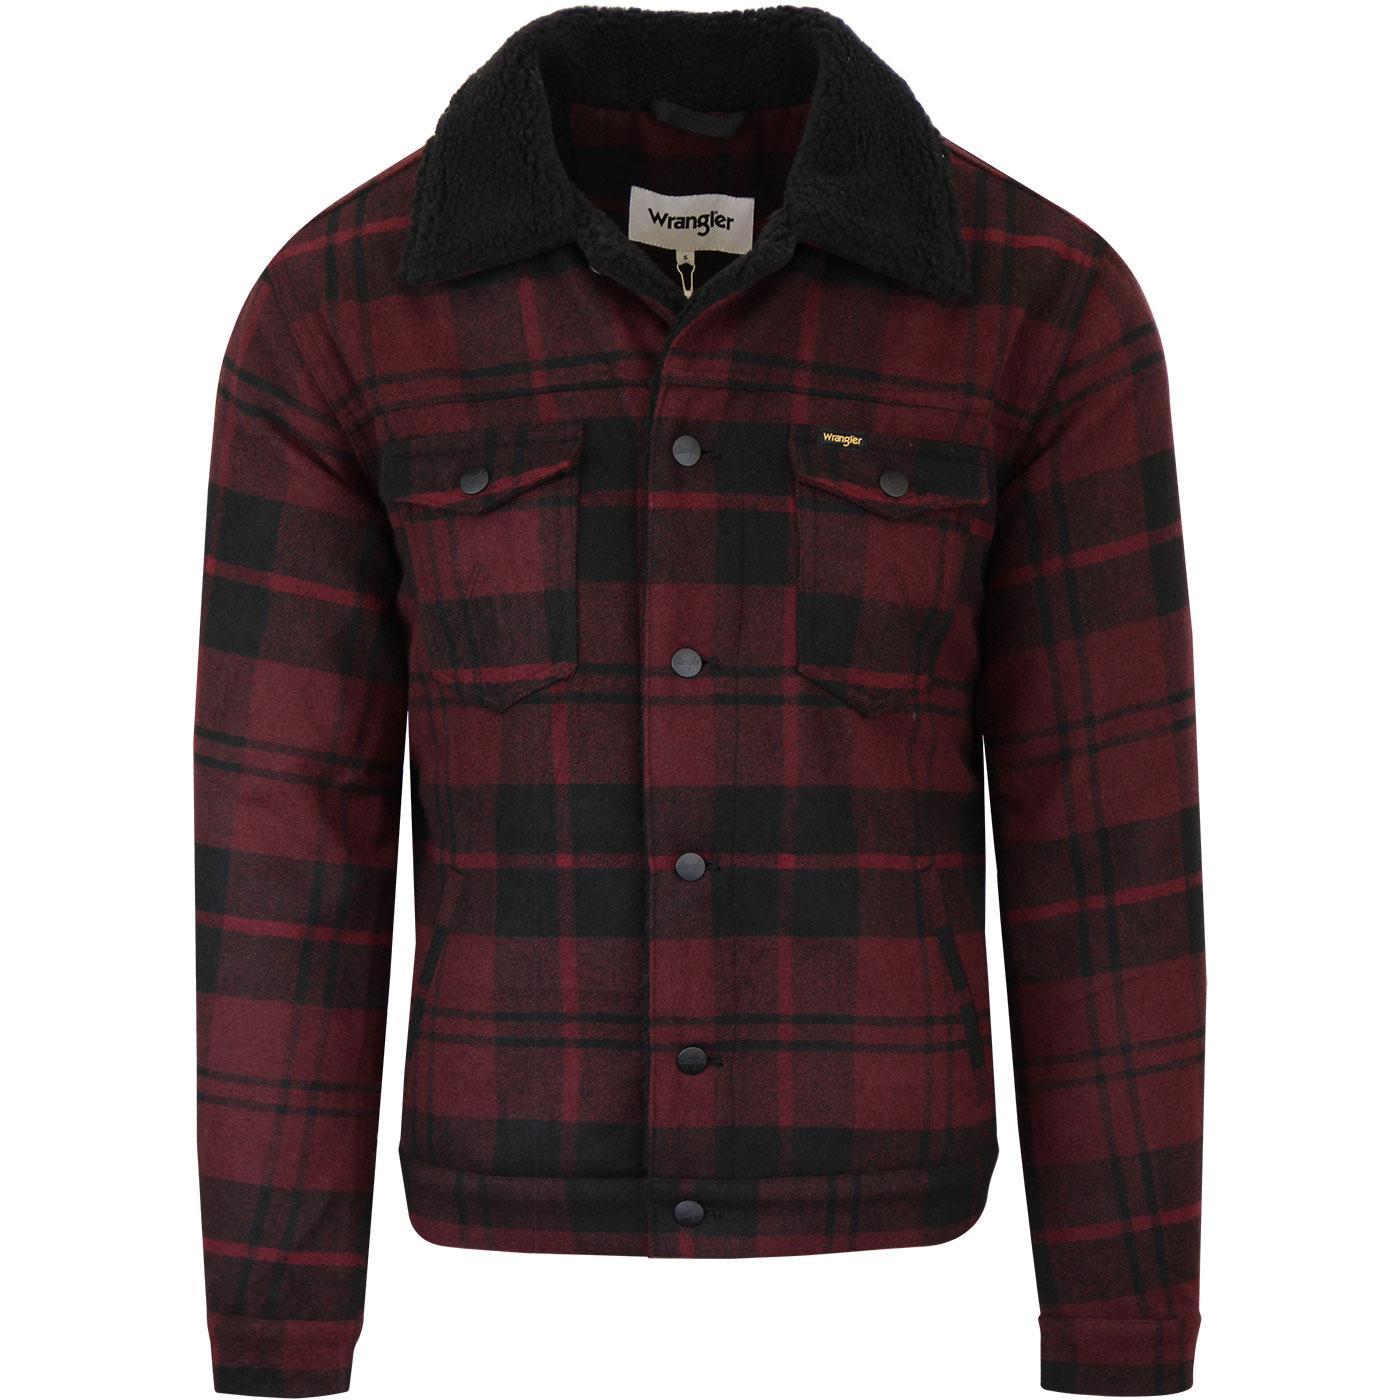 WRANGLER Wool Sherpa Trucker Jacket (Madder Brown)